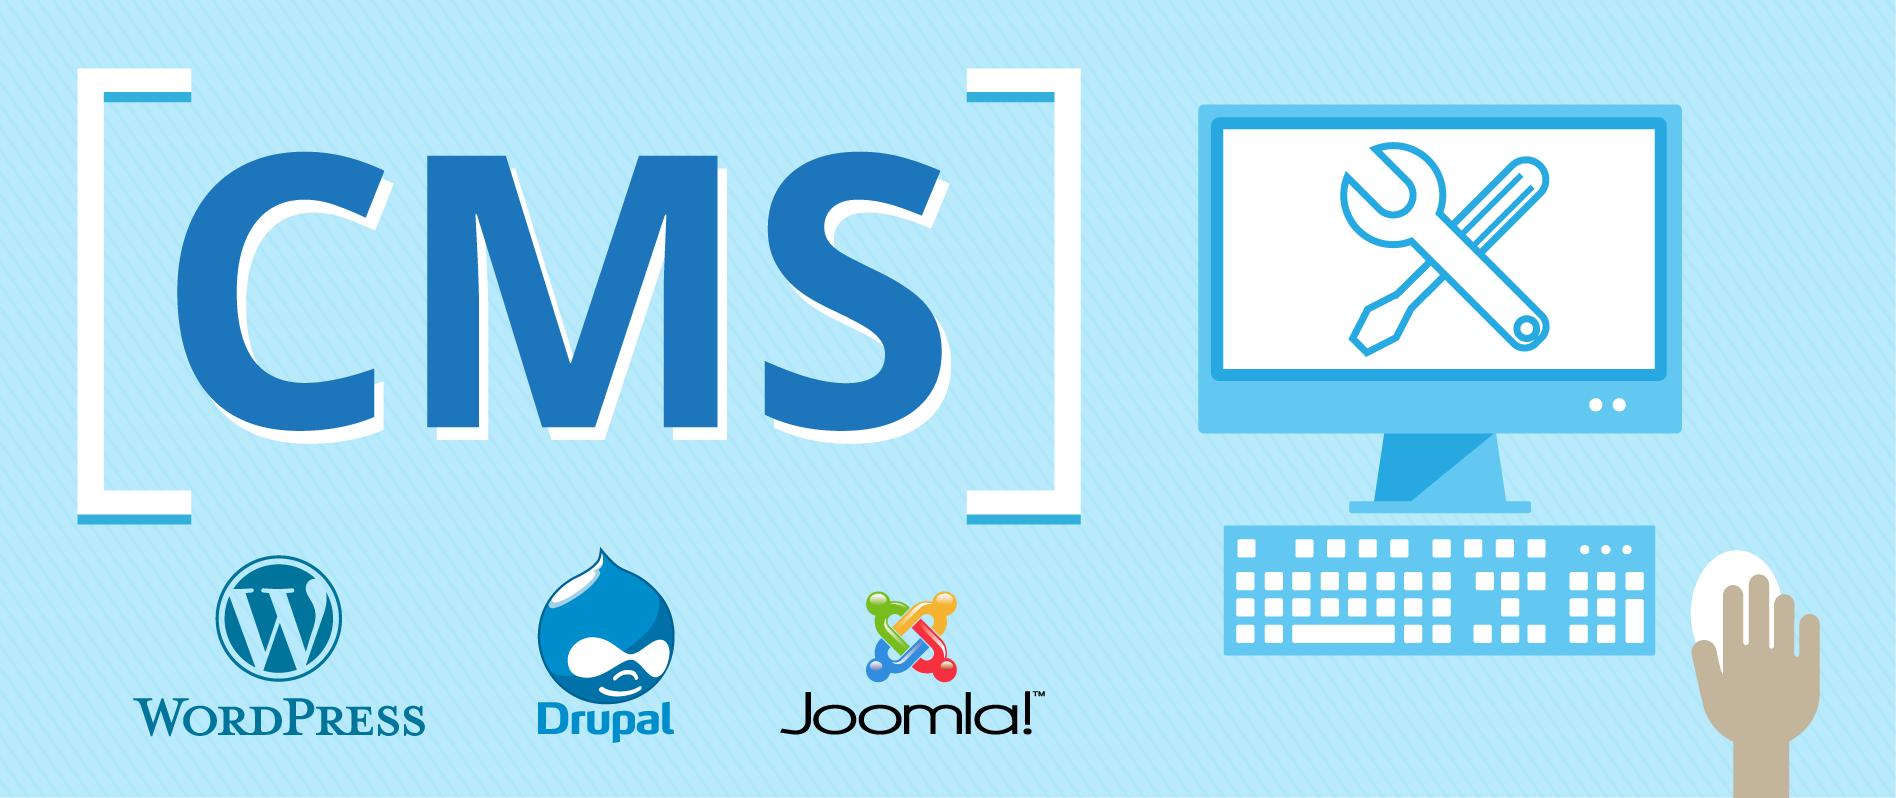 CMS Website Development in Bhubaneswar